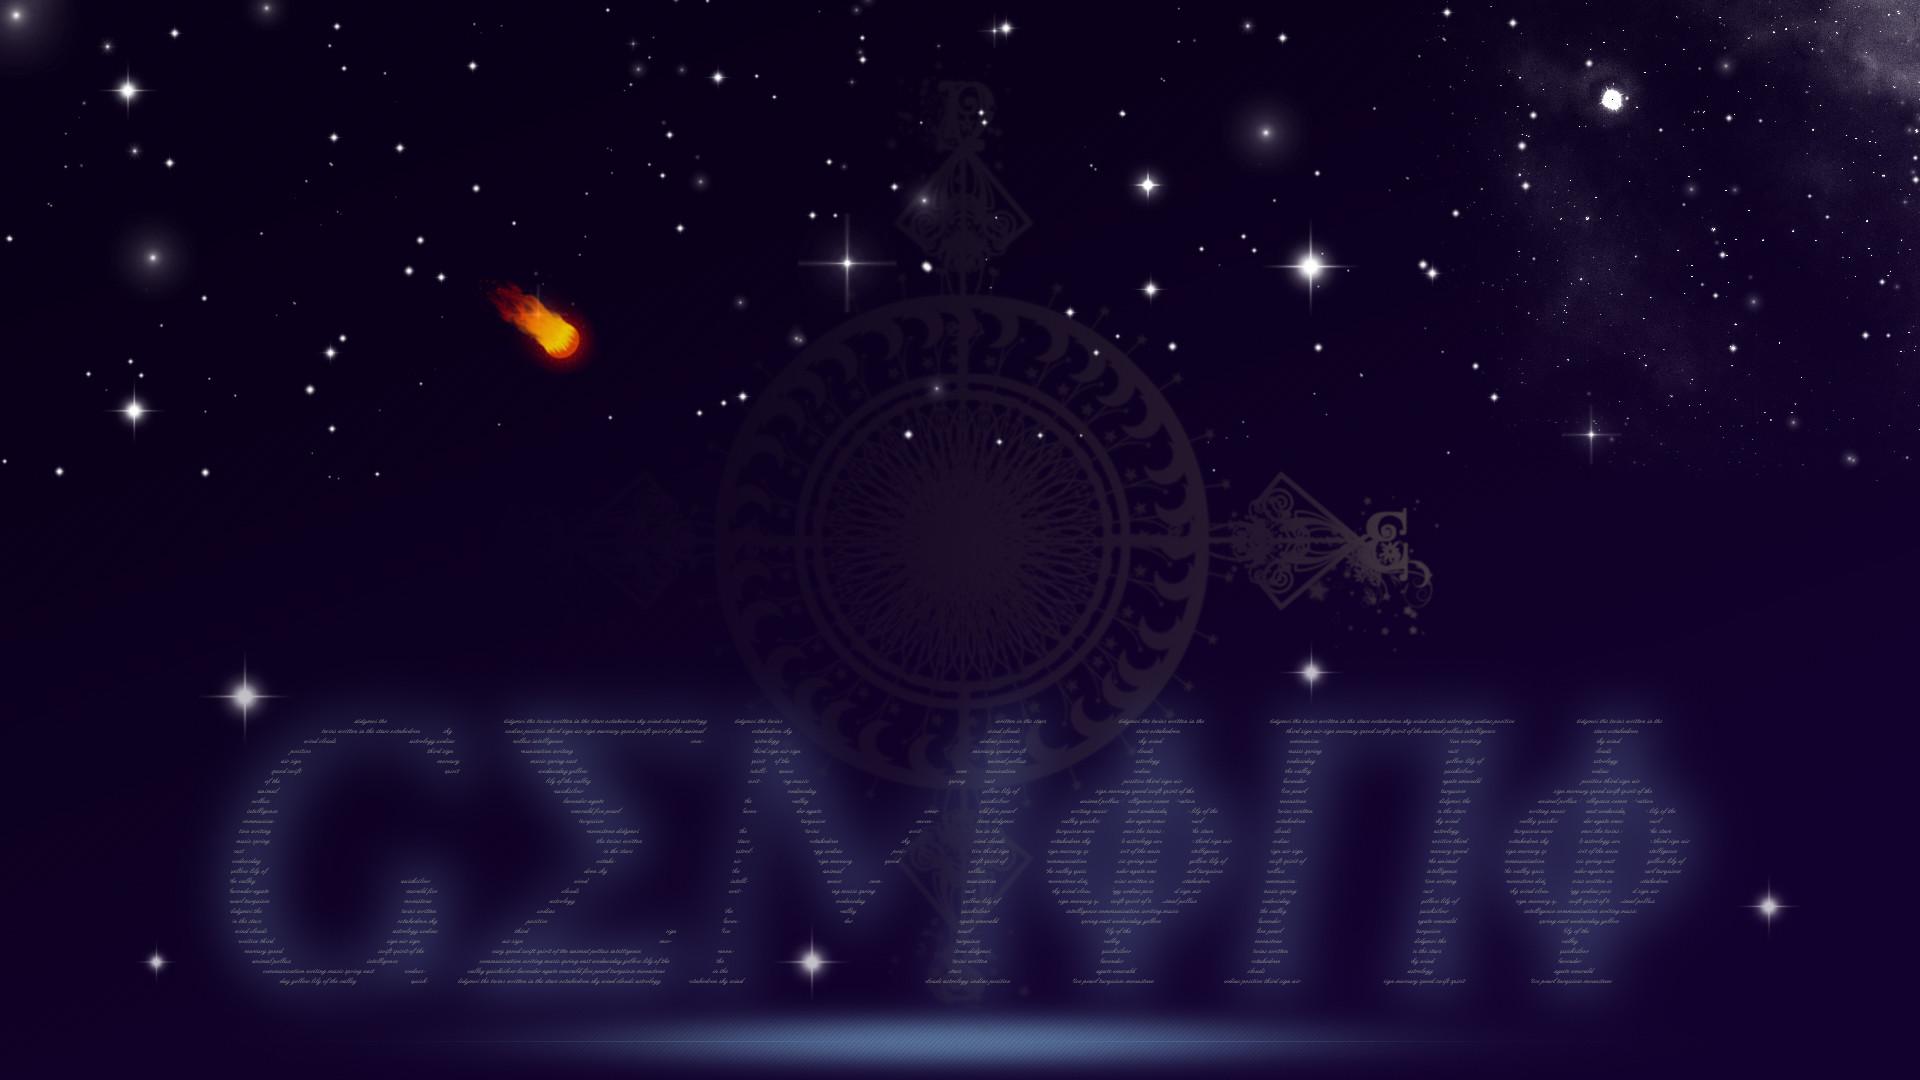 Gemini Wallpaper 72 Pictures